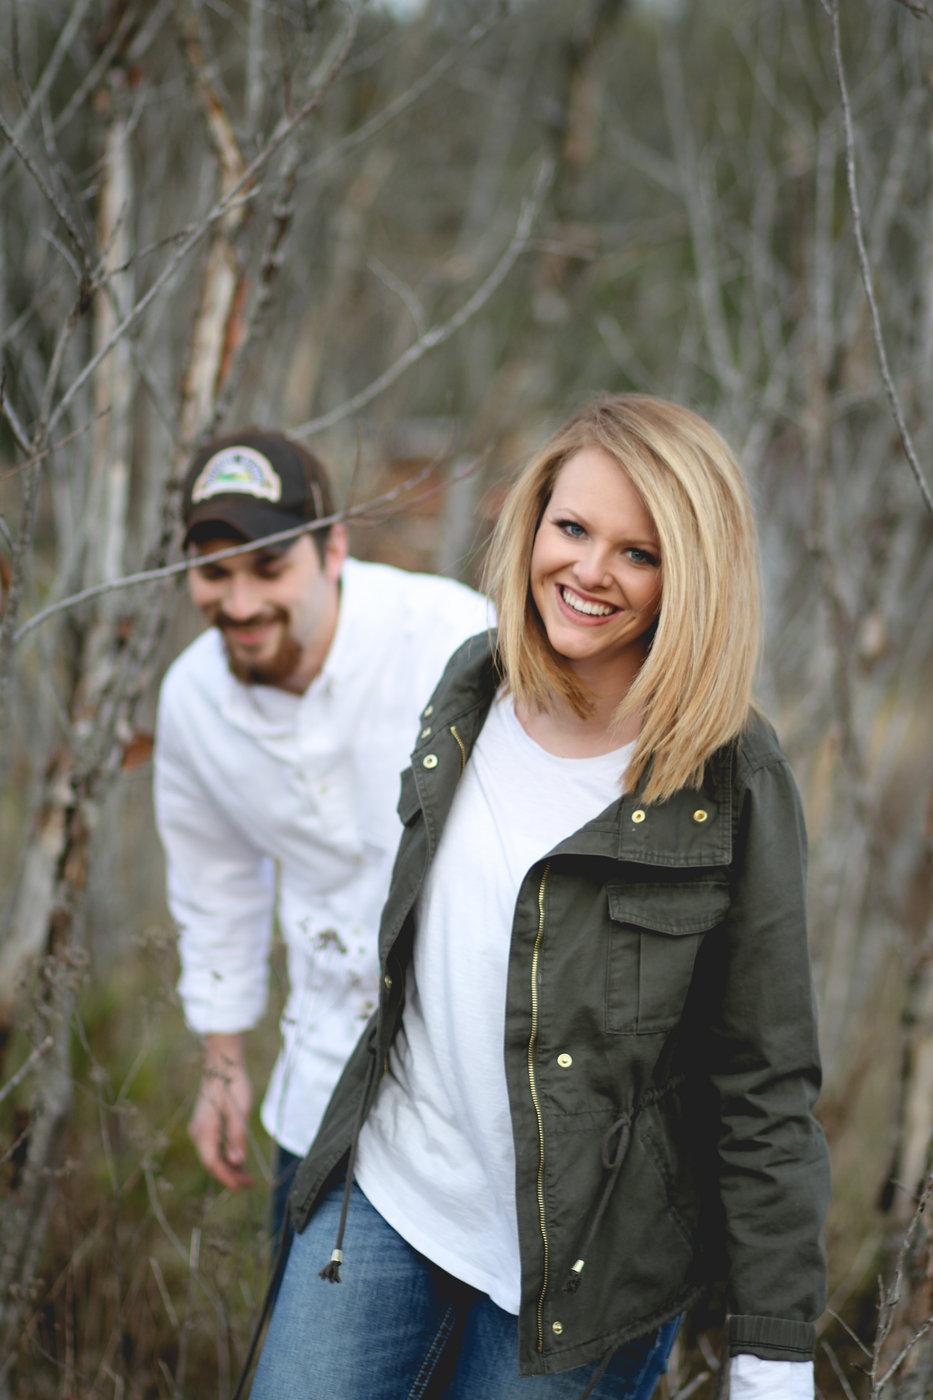 Jake and Katie-Engagement-0065.jpg